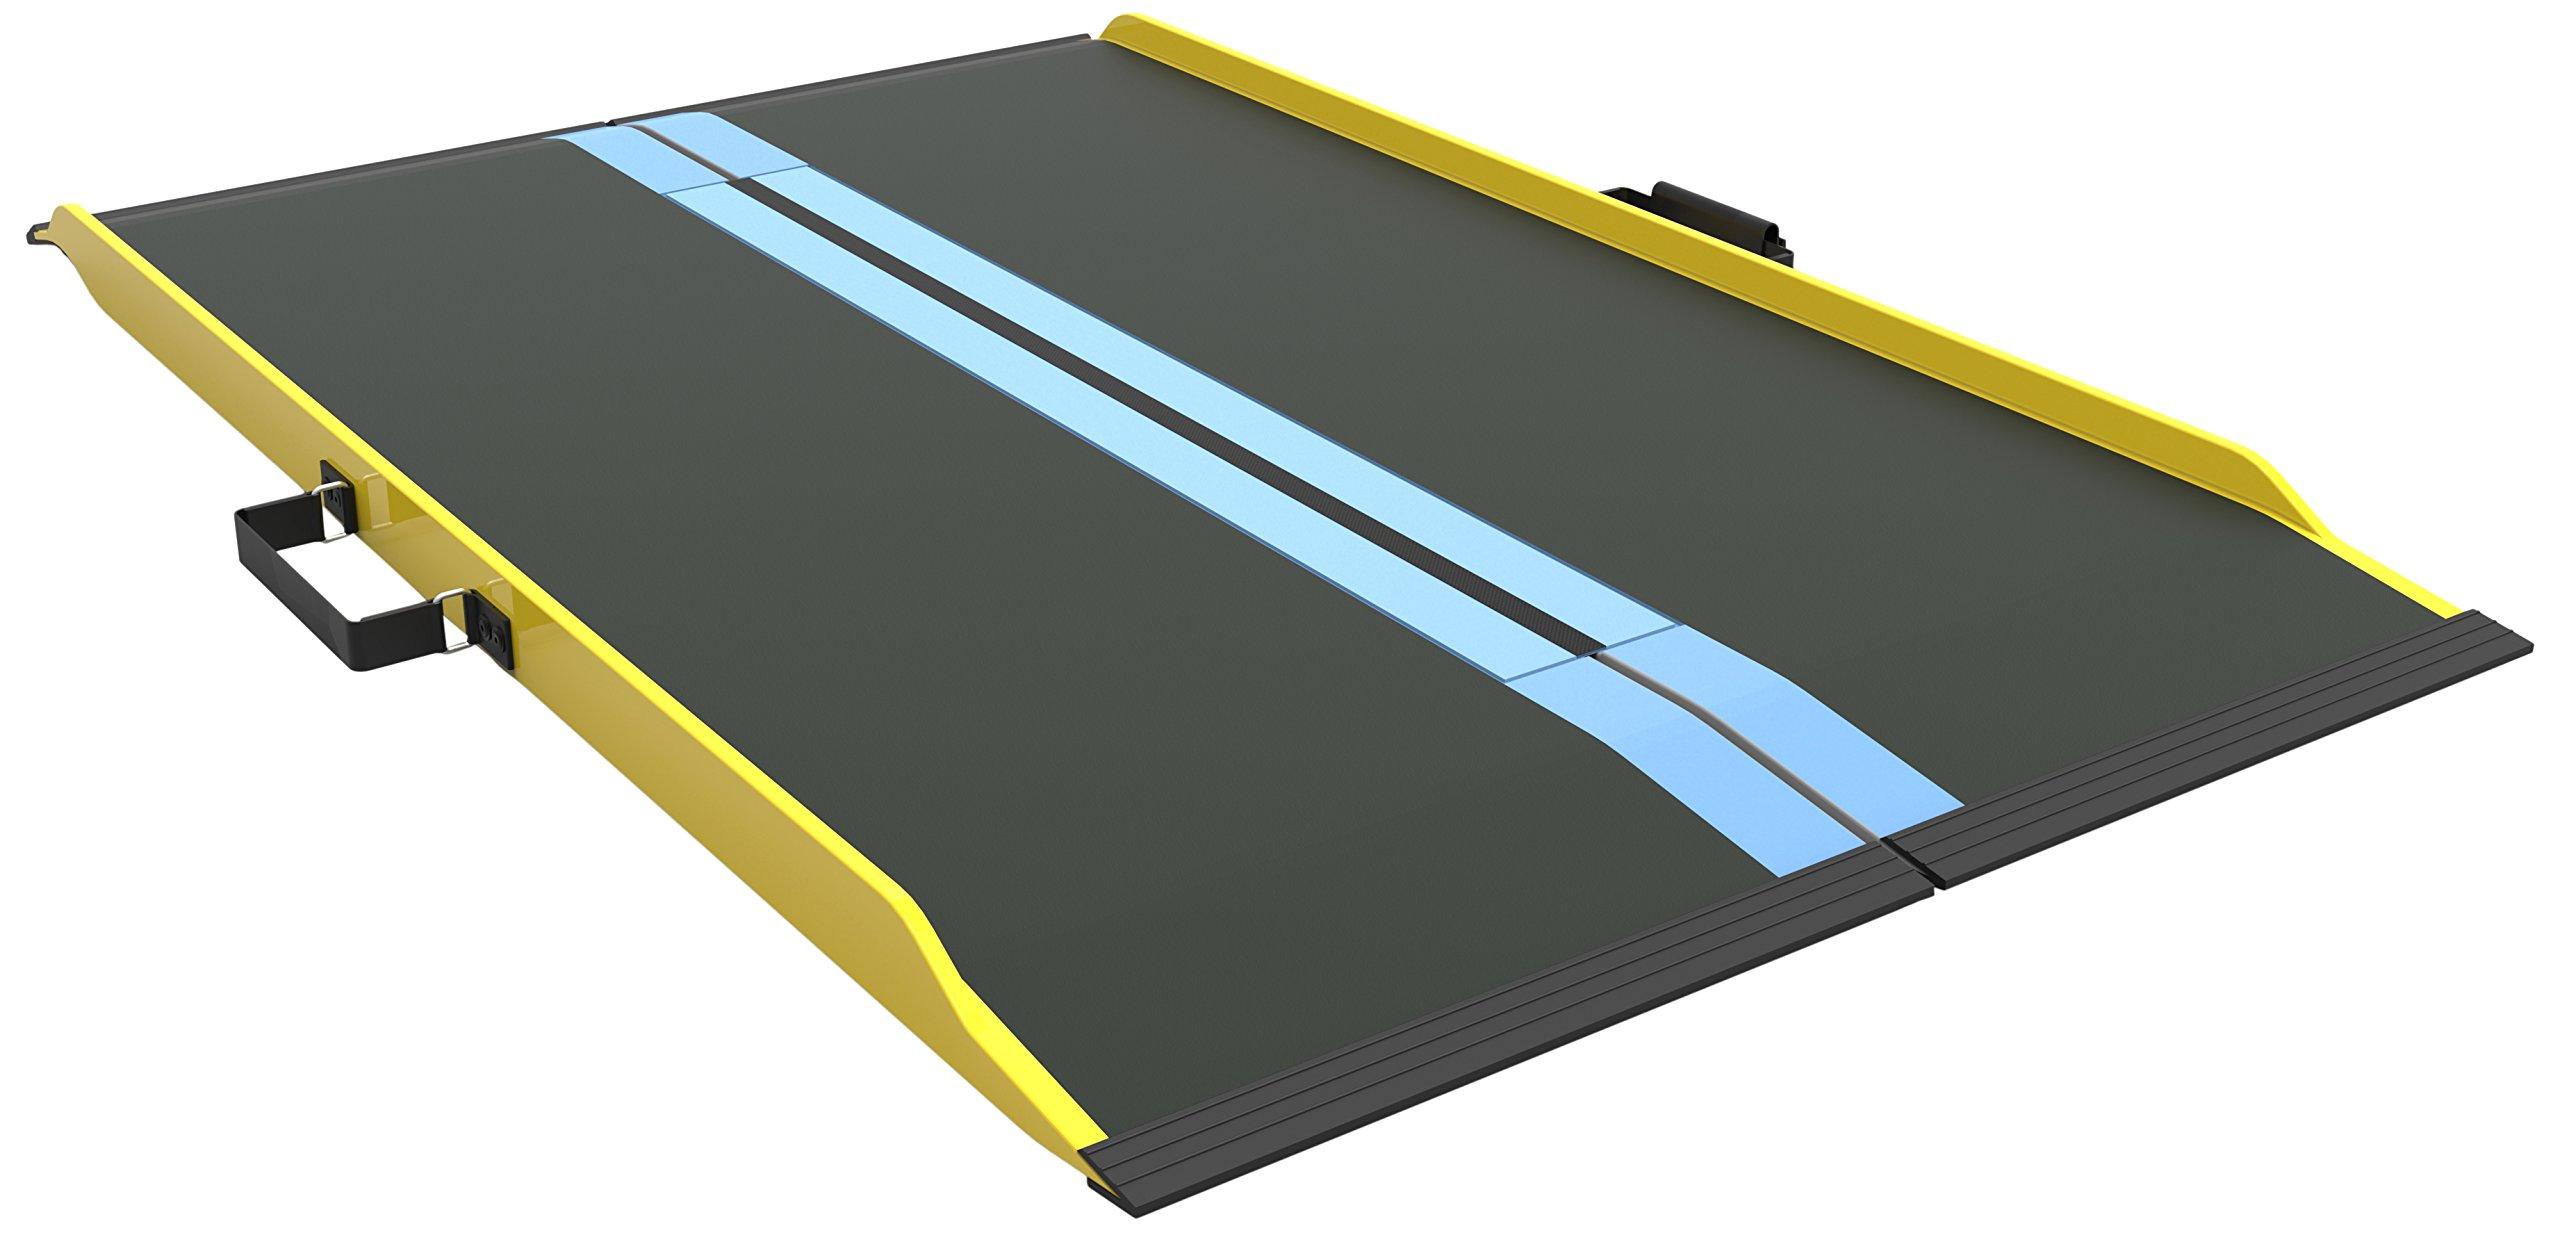 EZ-ACCESS Suitcase Singlefold Graphite Fiber Ramp, 51 Inch, 17 Pound